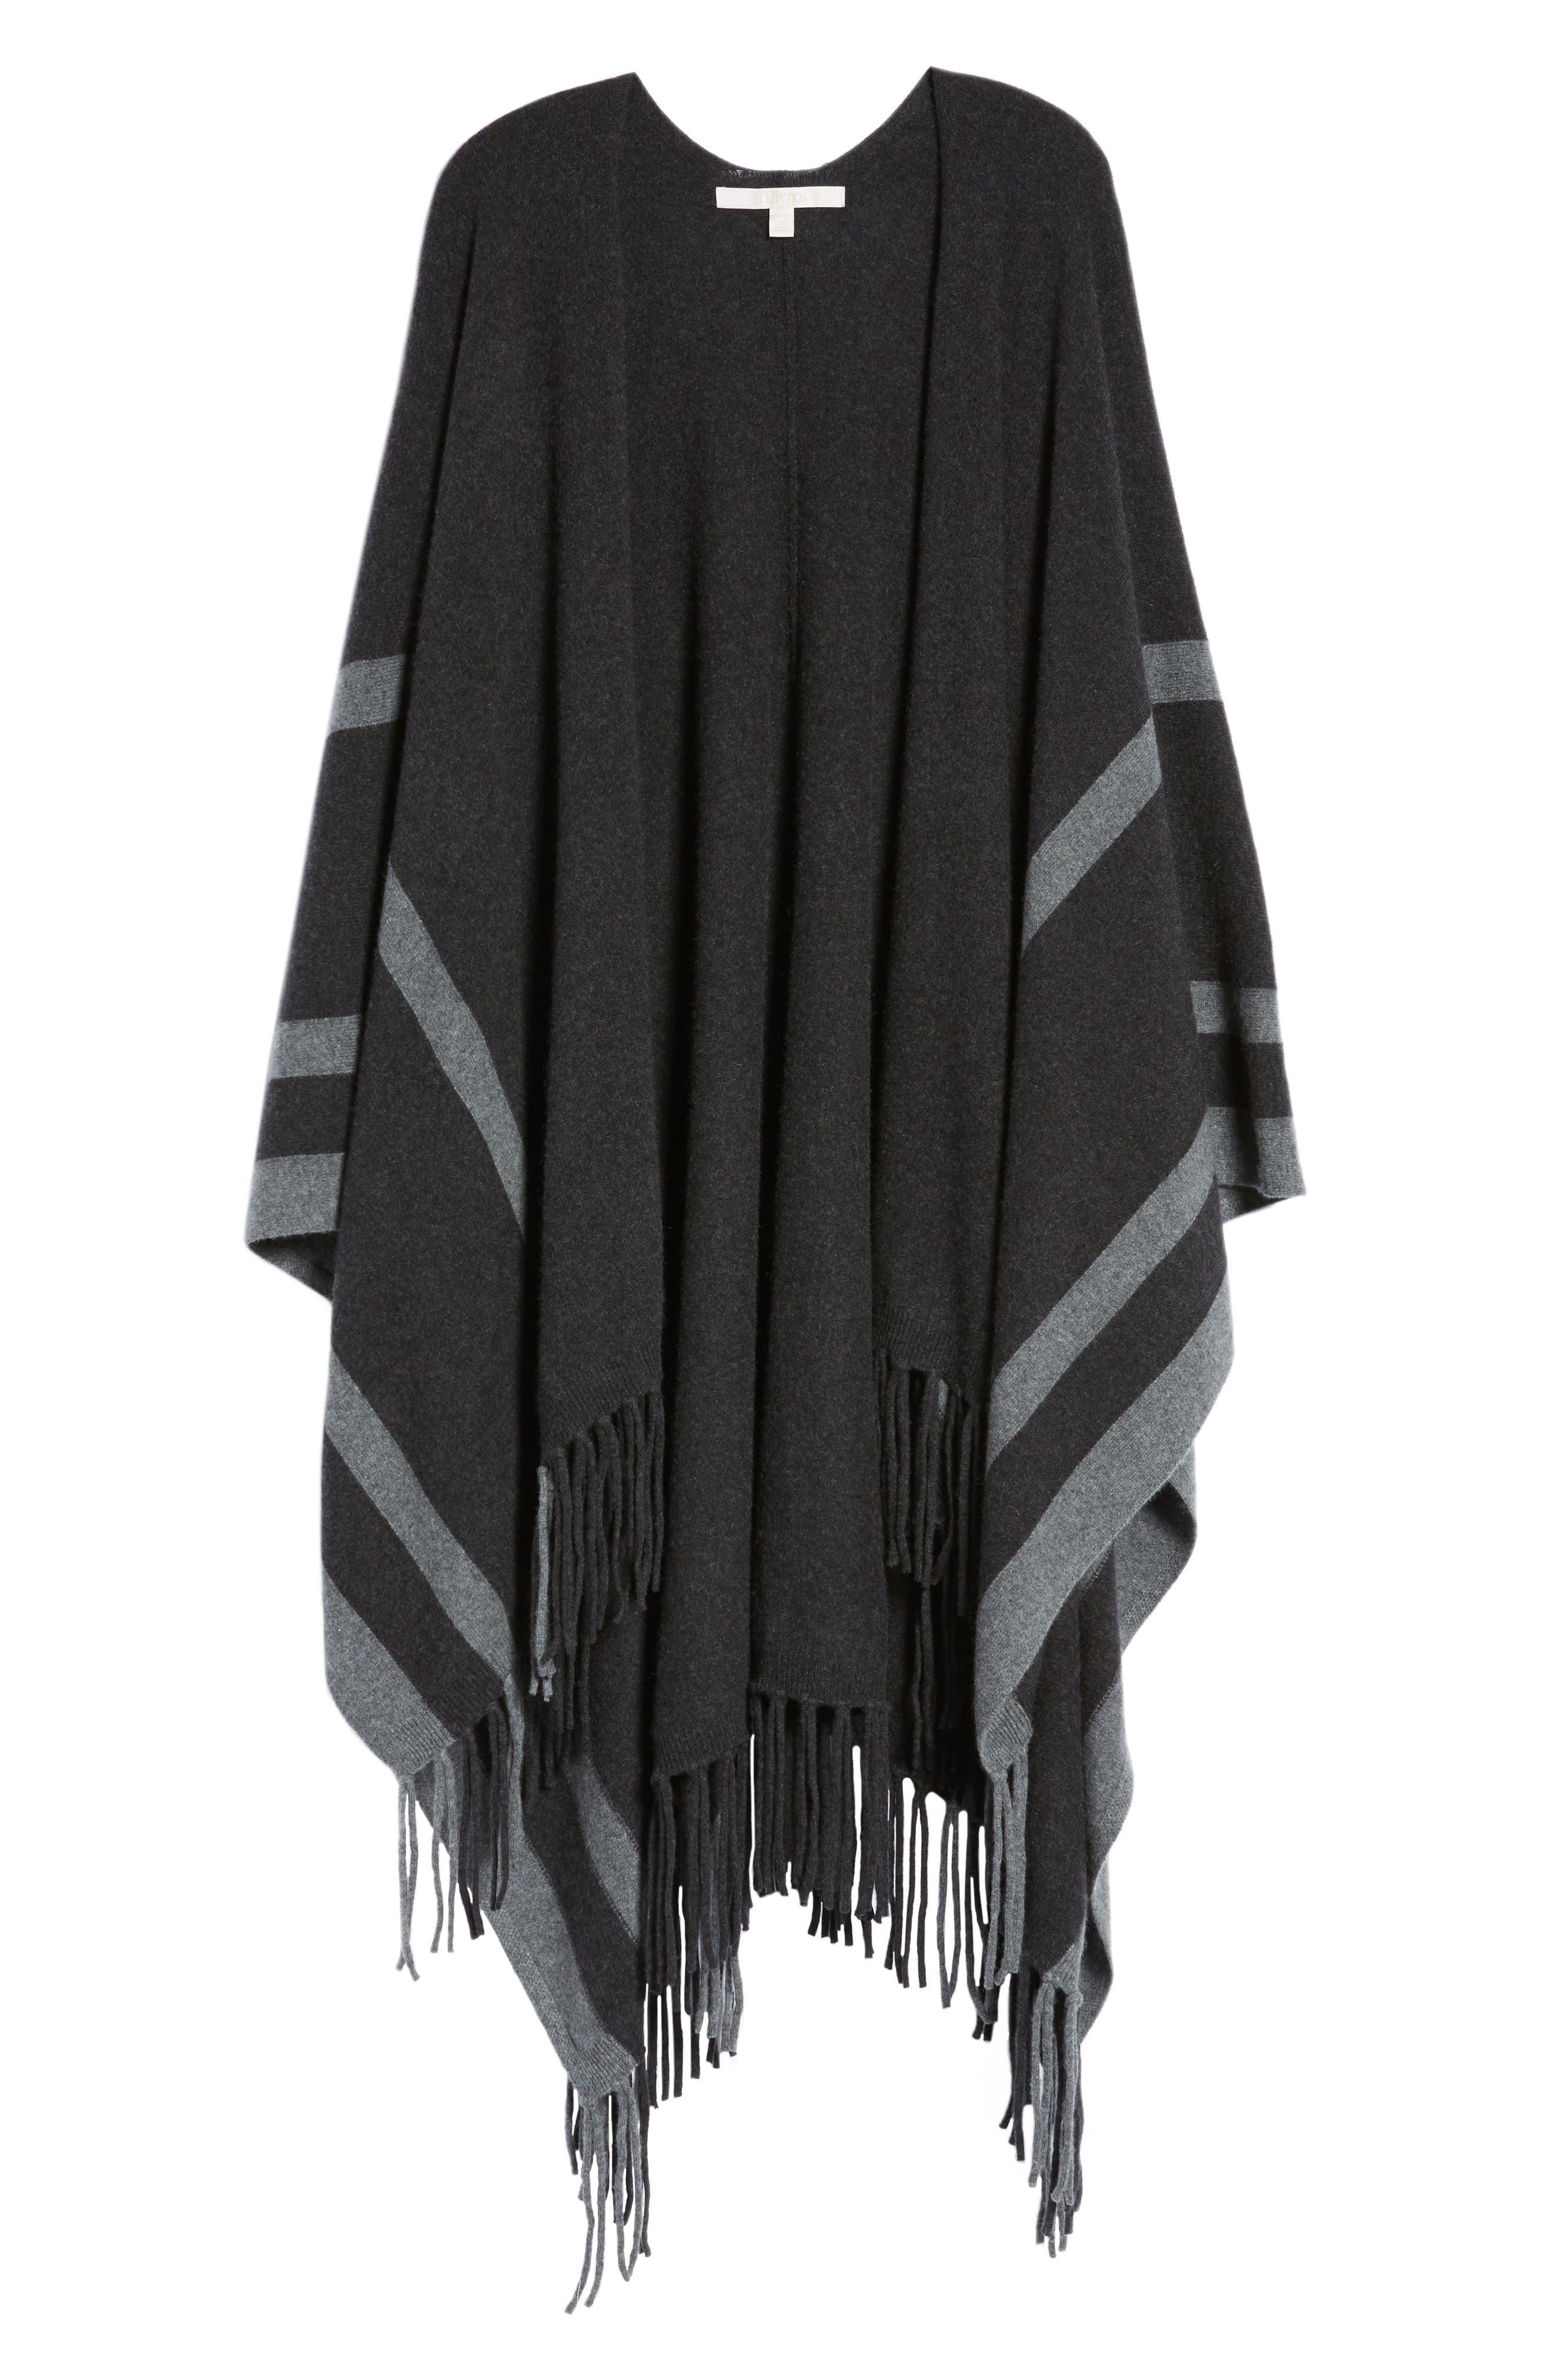 Luxe Stripe Cashmere Ruana,                             Alternate thumbnail 6, color,                             Black Rock Heather Combo